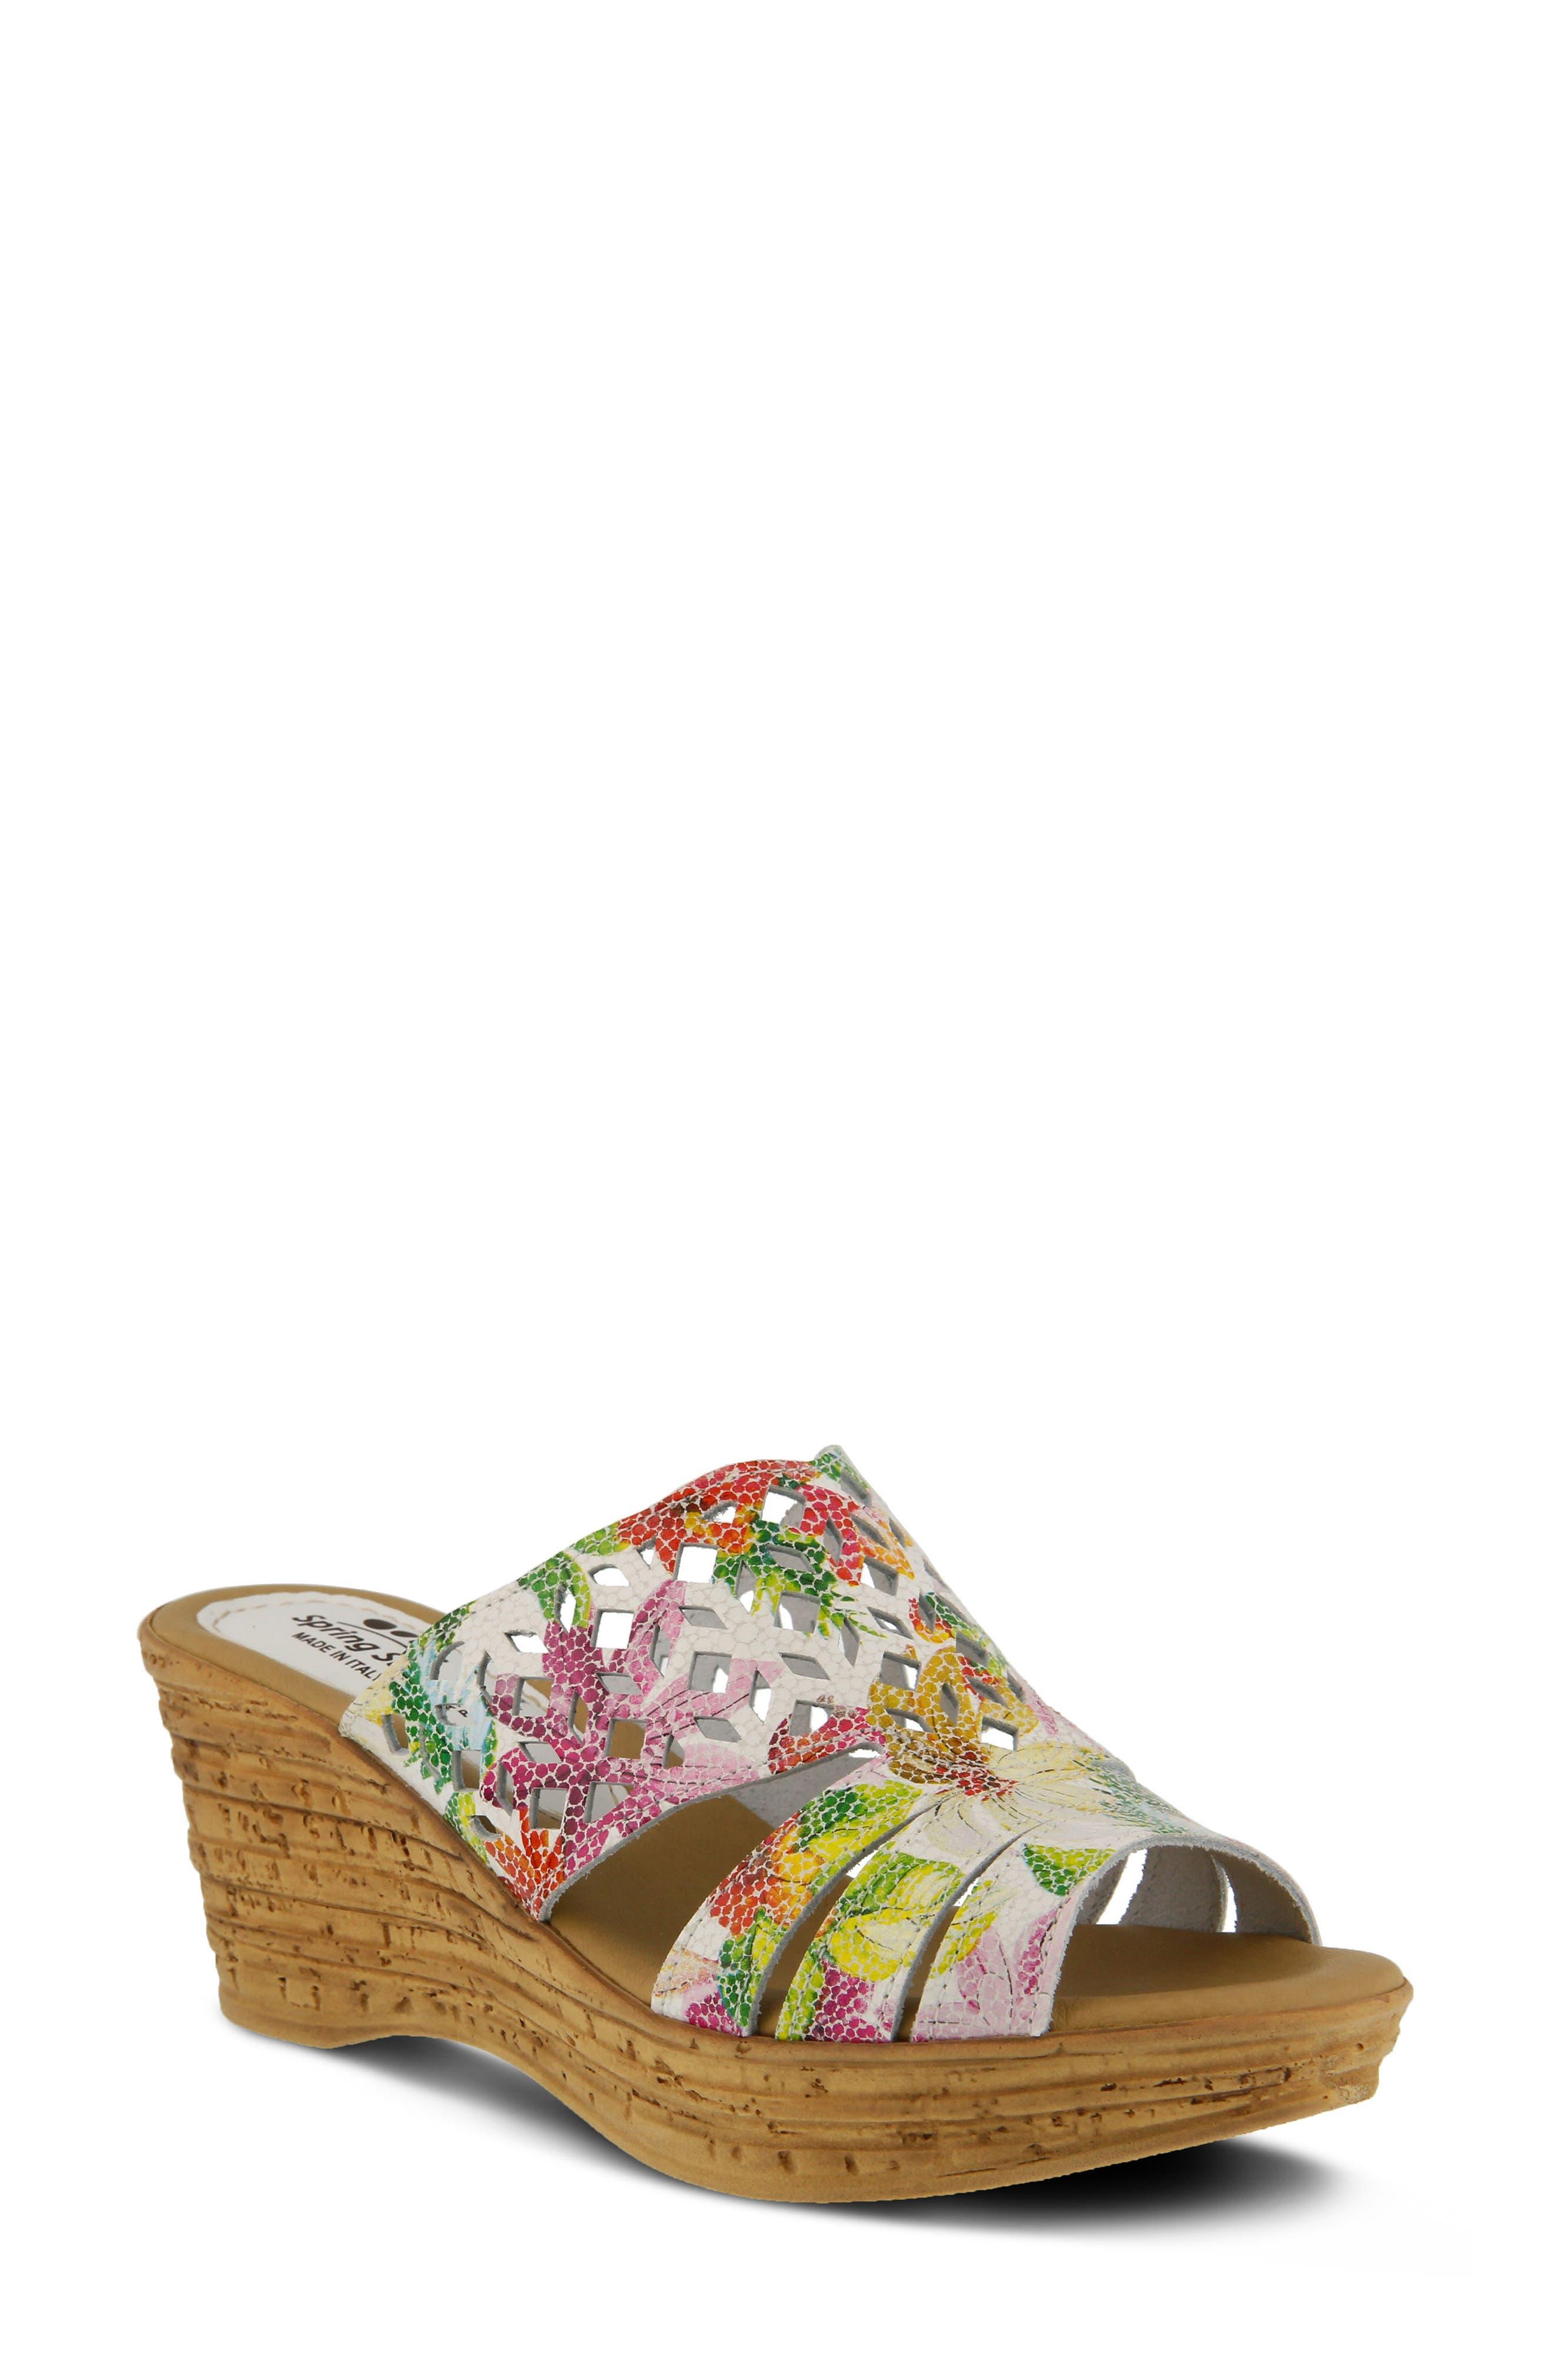 Viniko Platform Wedge Sandal,                             Main thumbnail 1, color,                             White Leather